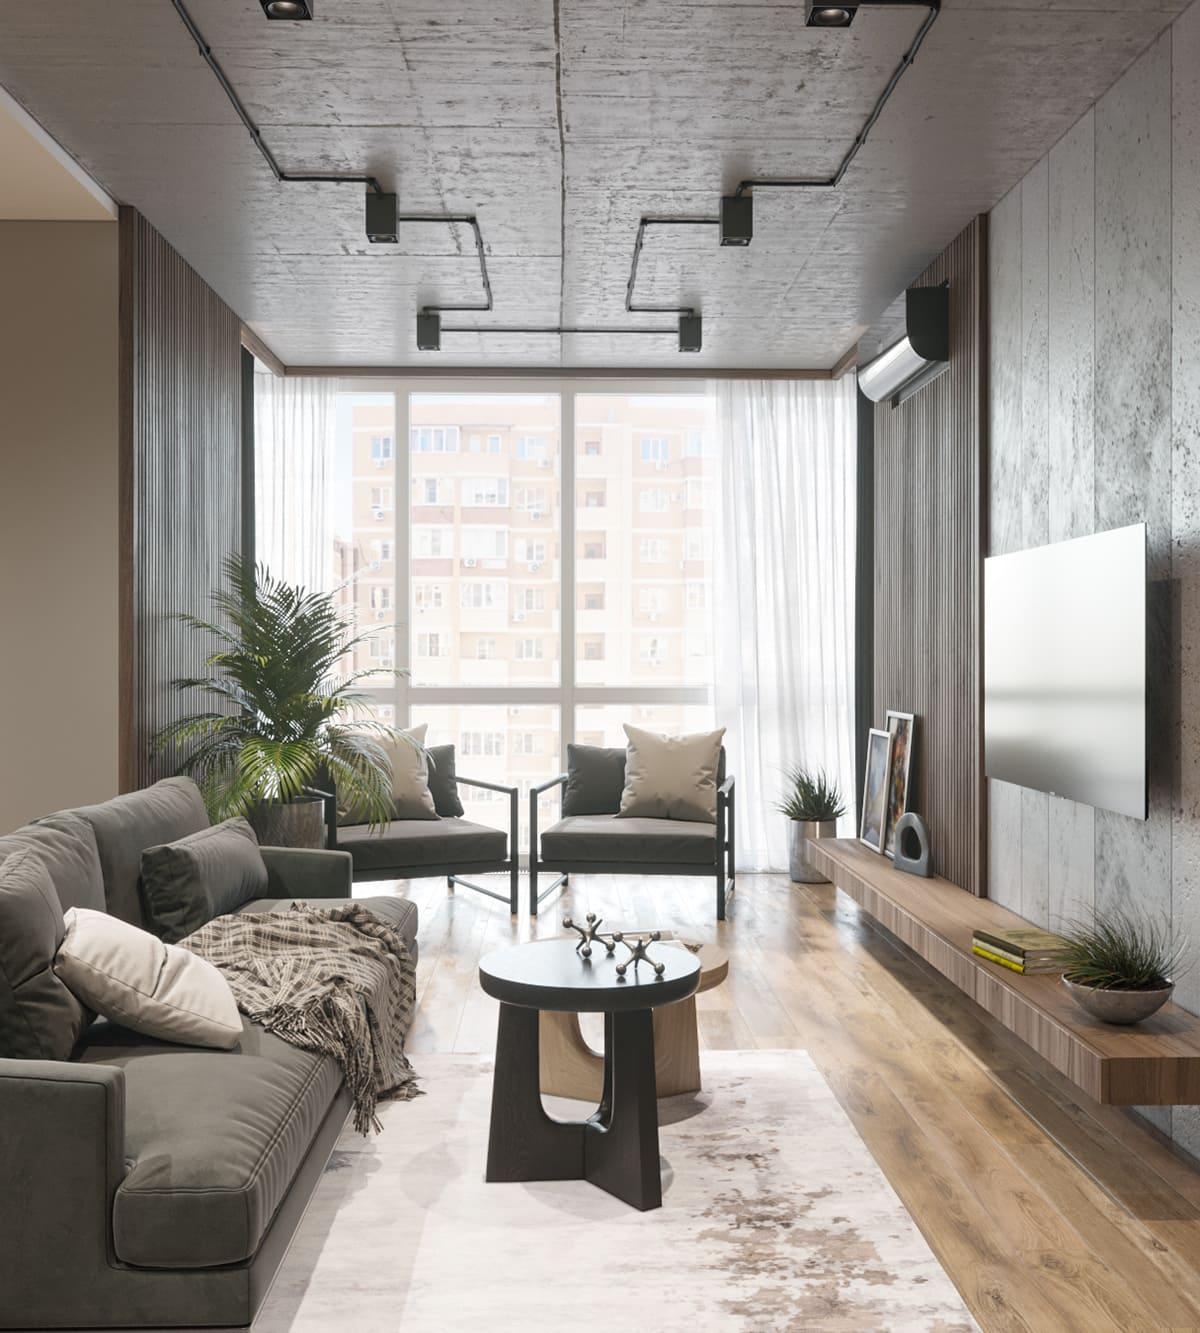 дизайн однокомнатной квартиры фото 60